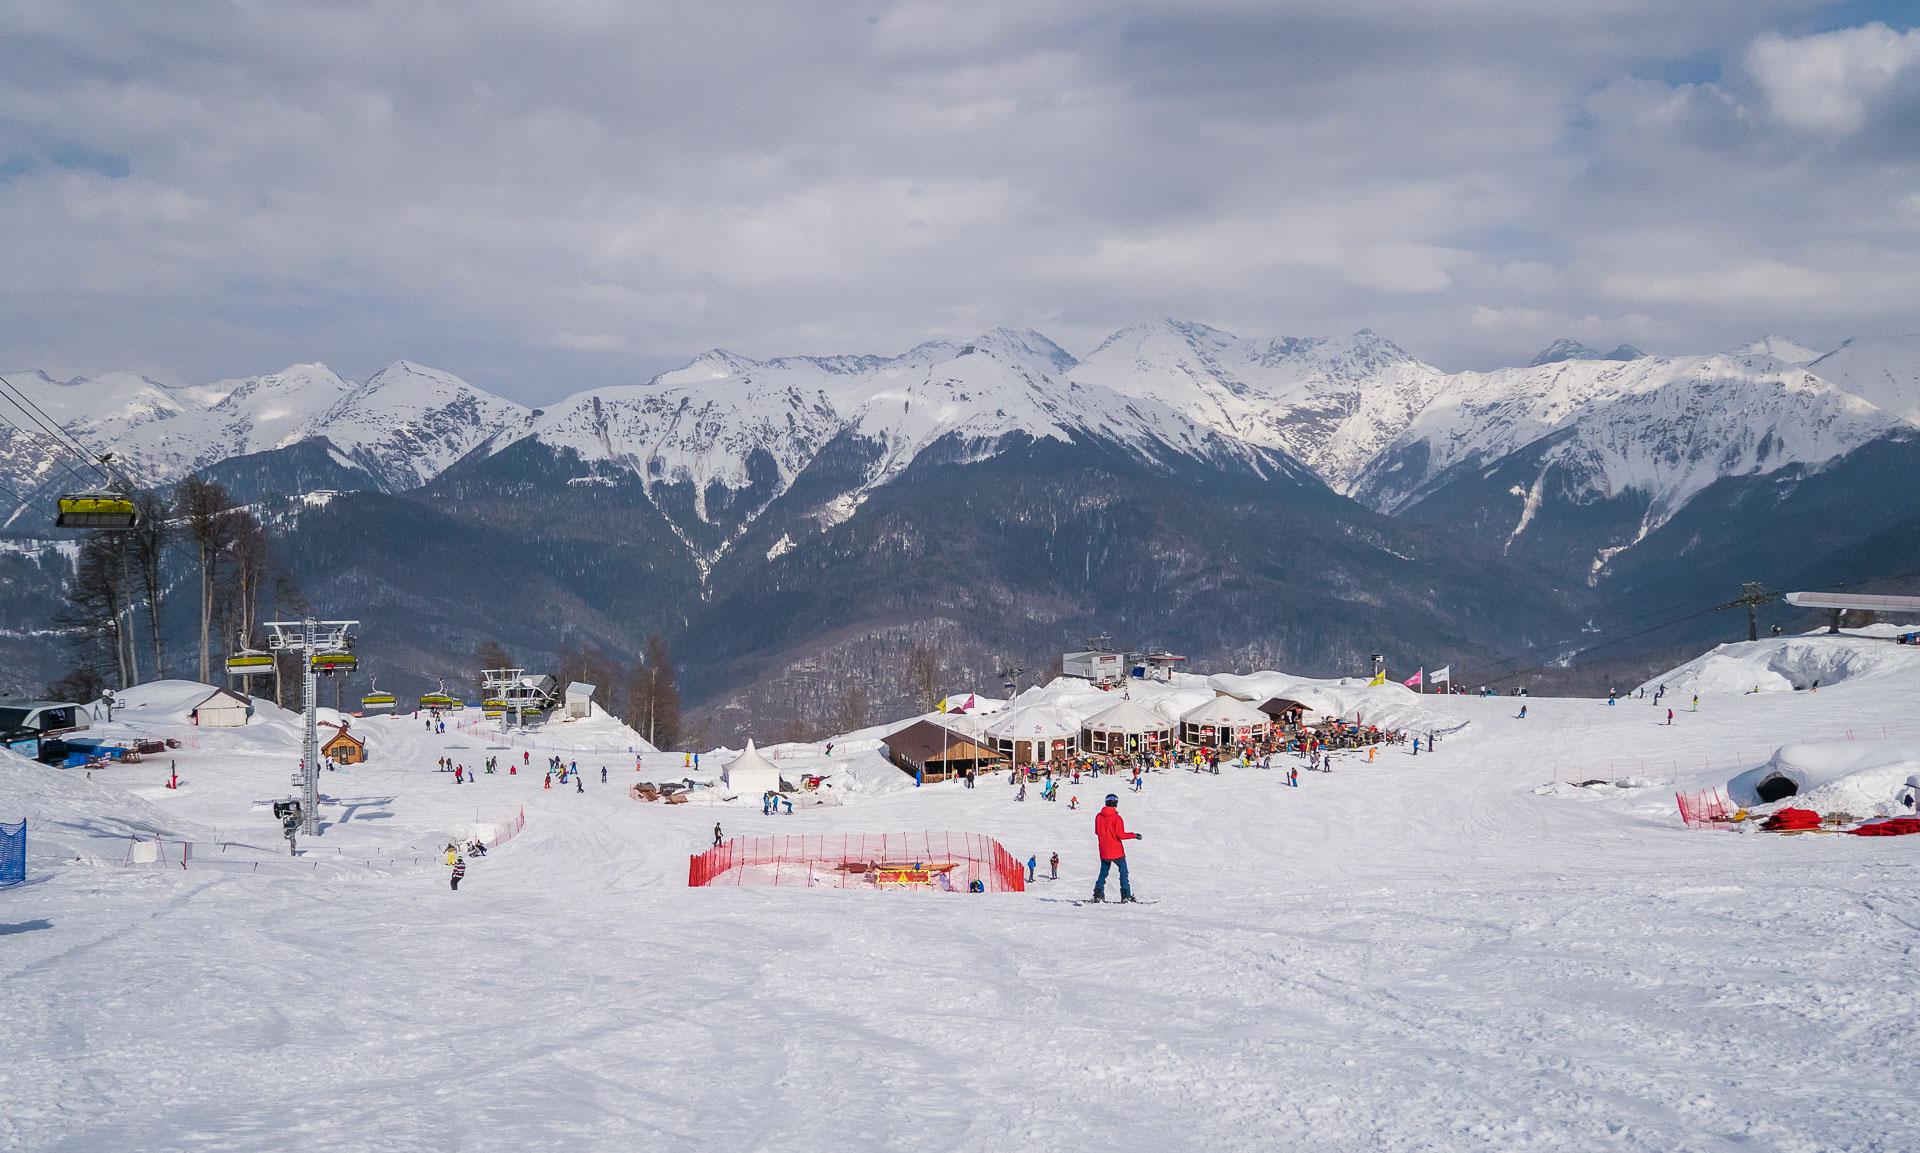 Горный курорт Роза-Хутор. Вид на 1600 м